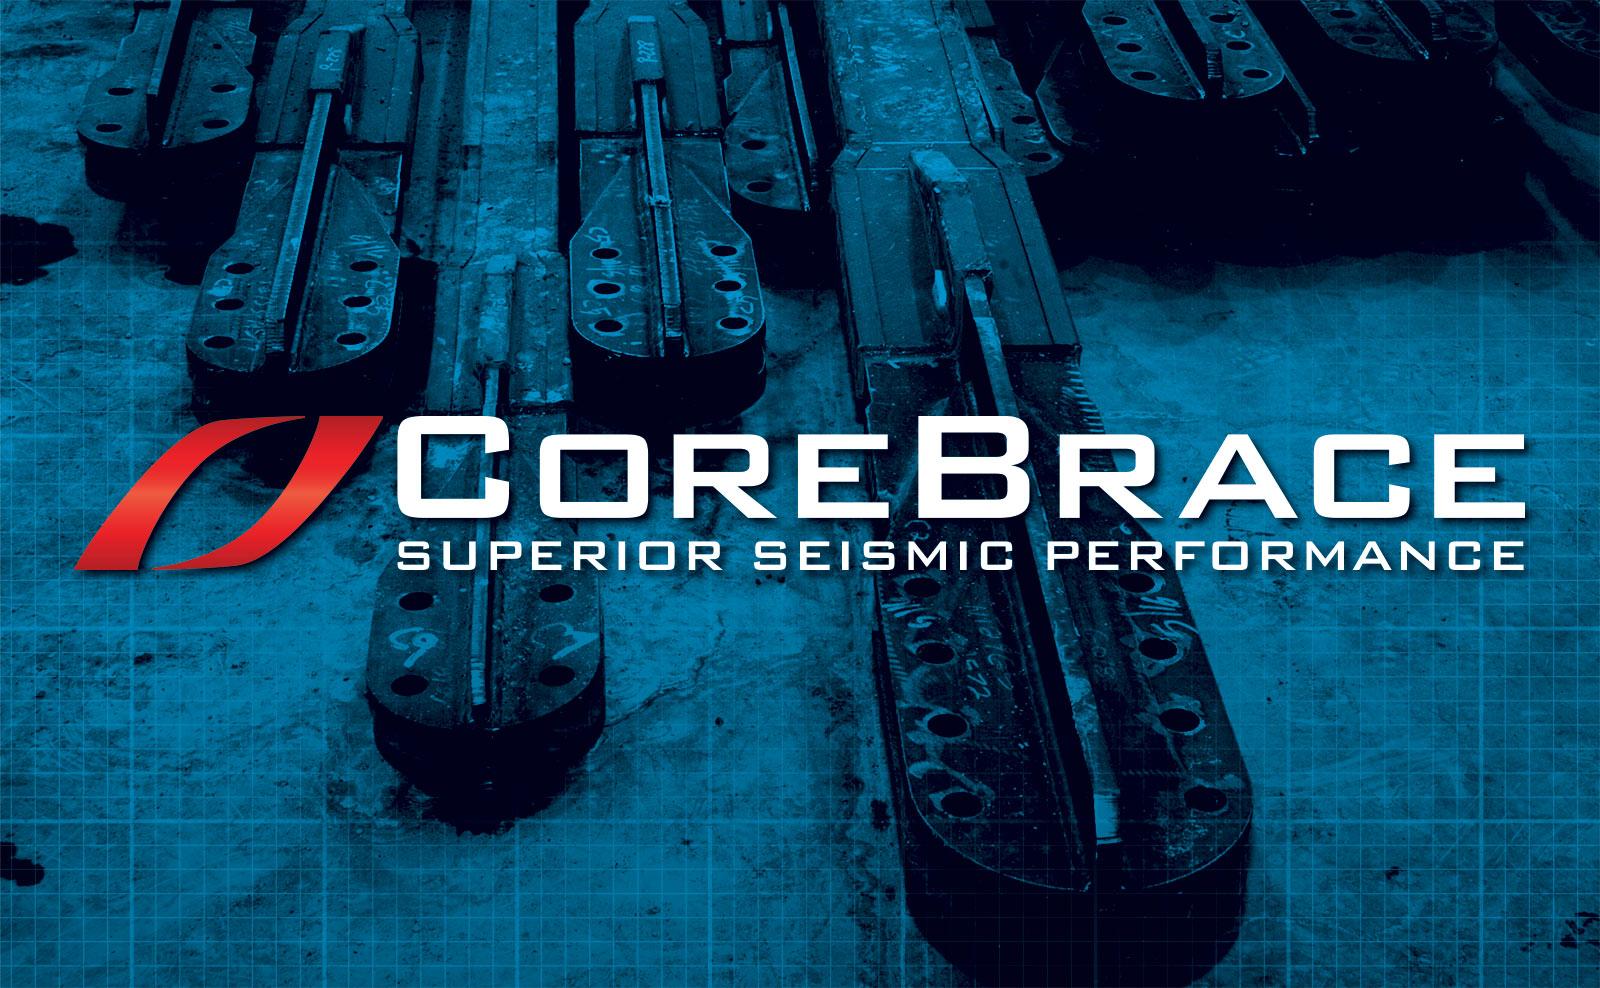 CoreBrace Press Release